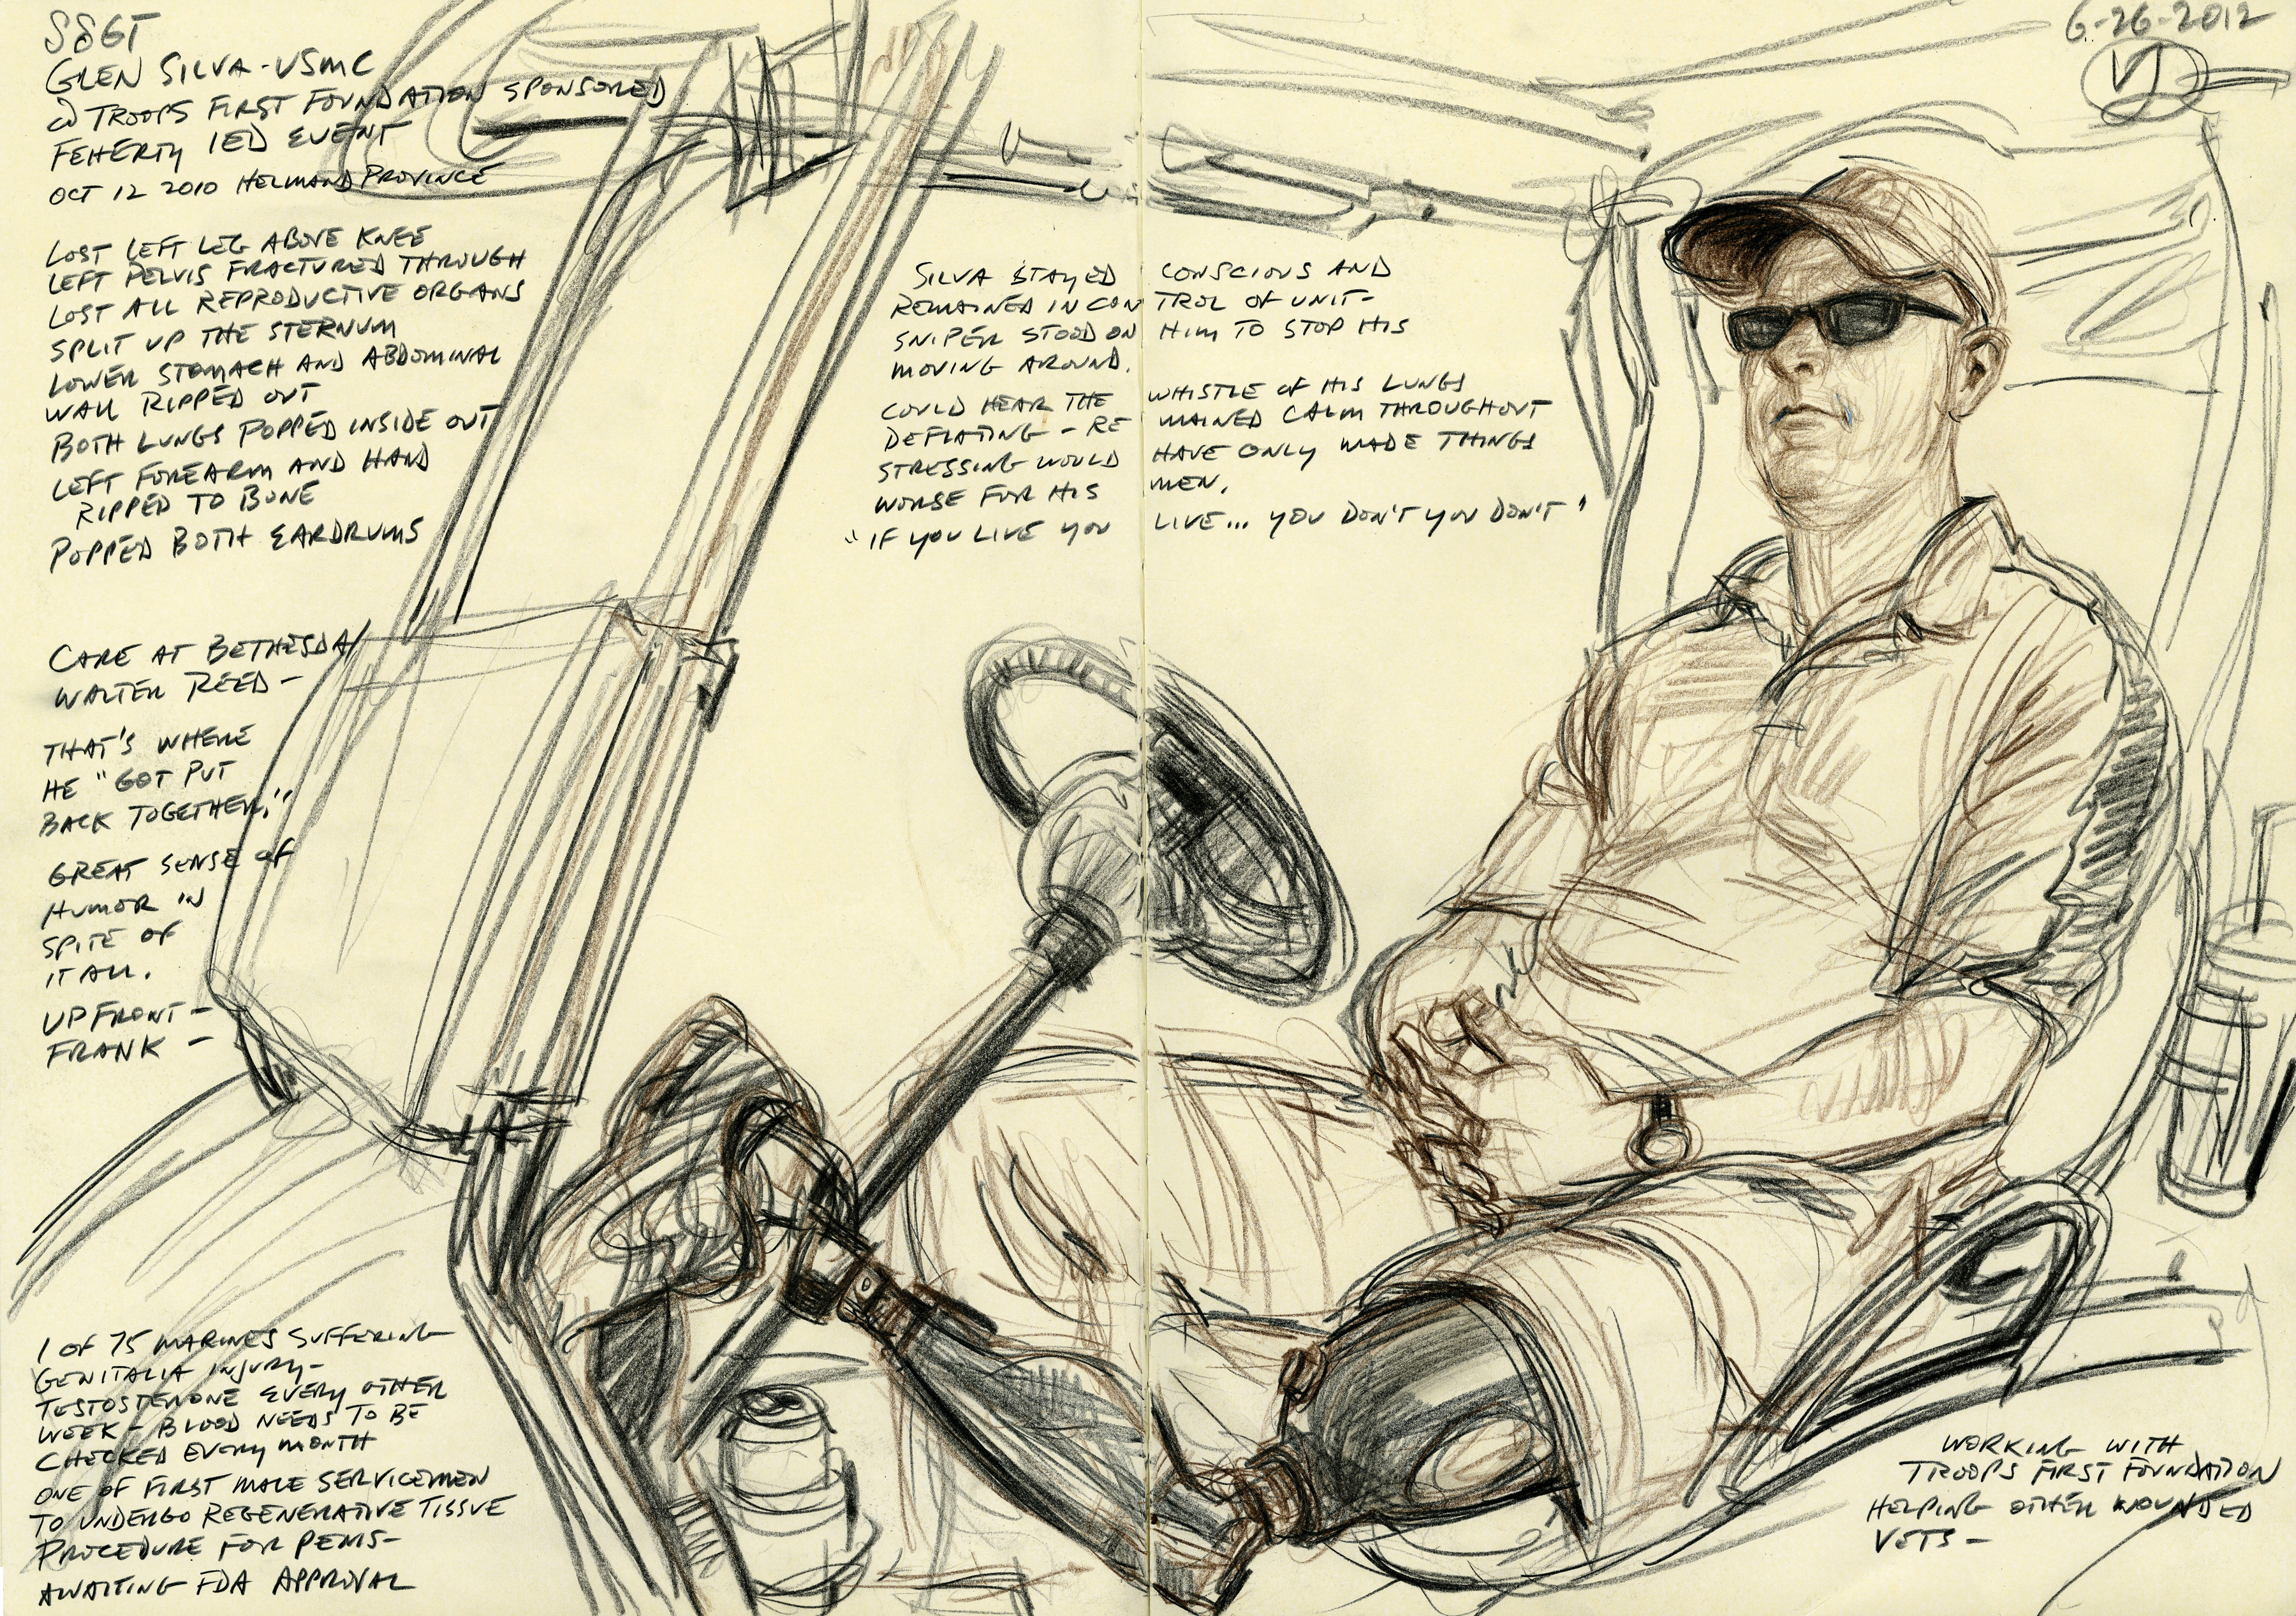 "<div>""Staff Sergeant Glen Silva USMC"" by Victor Juhasz, 2012</div>"